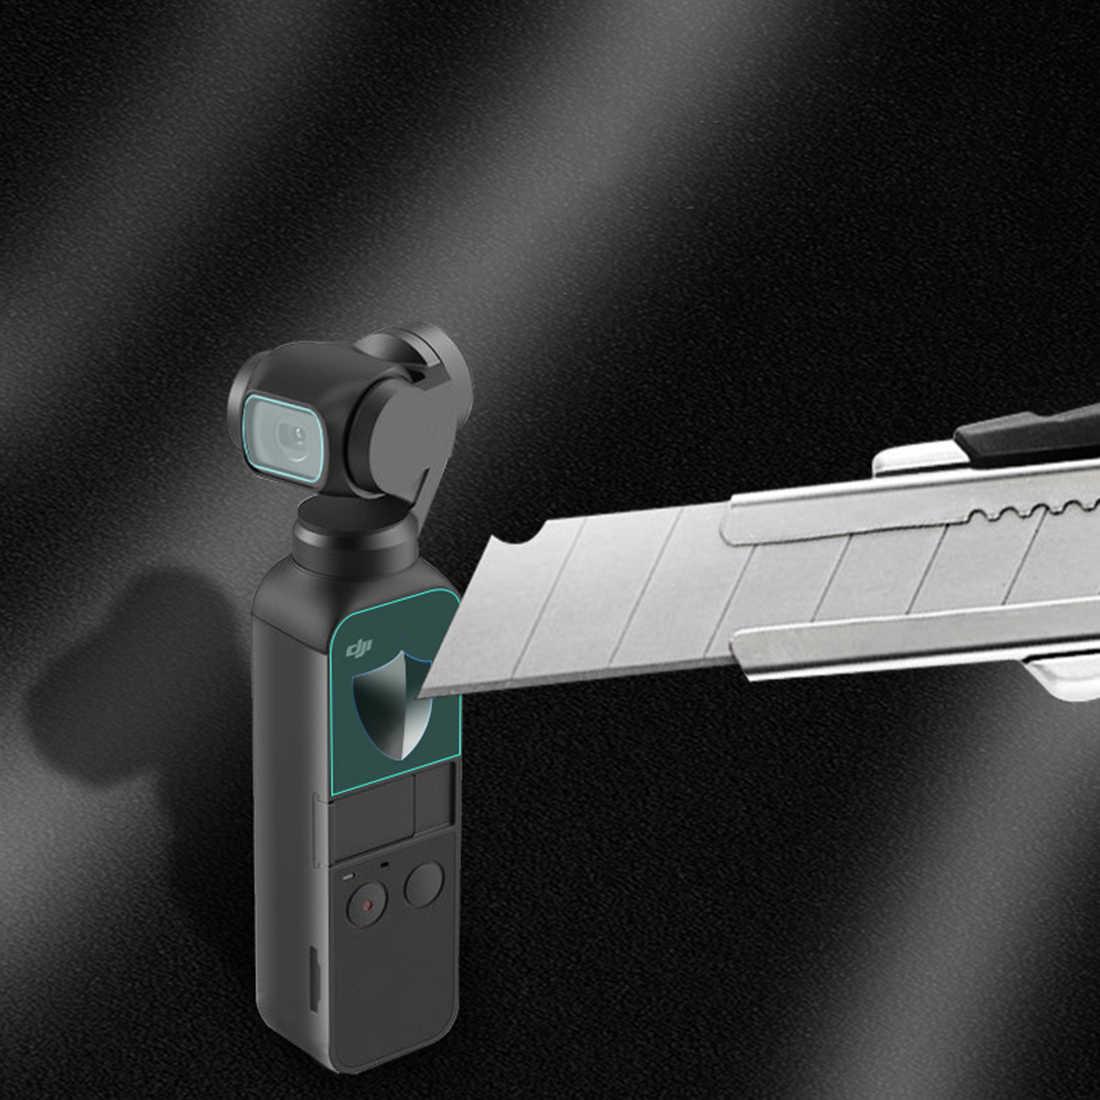 2/4/6 pièces 0.33mm lentille Film de protection en verre trempé écran de protection pour DJI Osmo poche cardan 3 axes stabilisé caméra portable